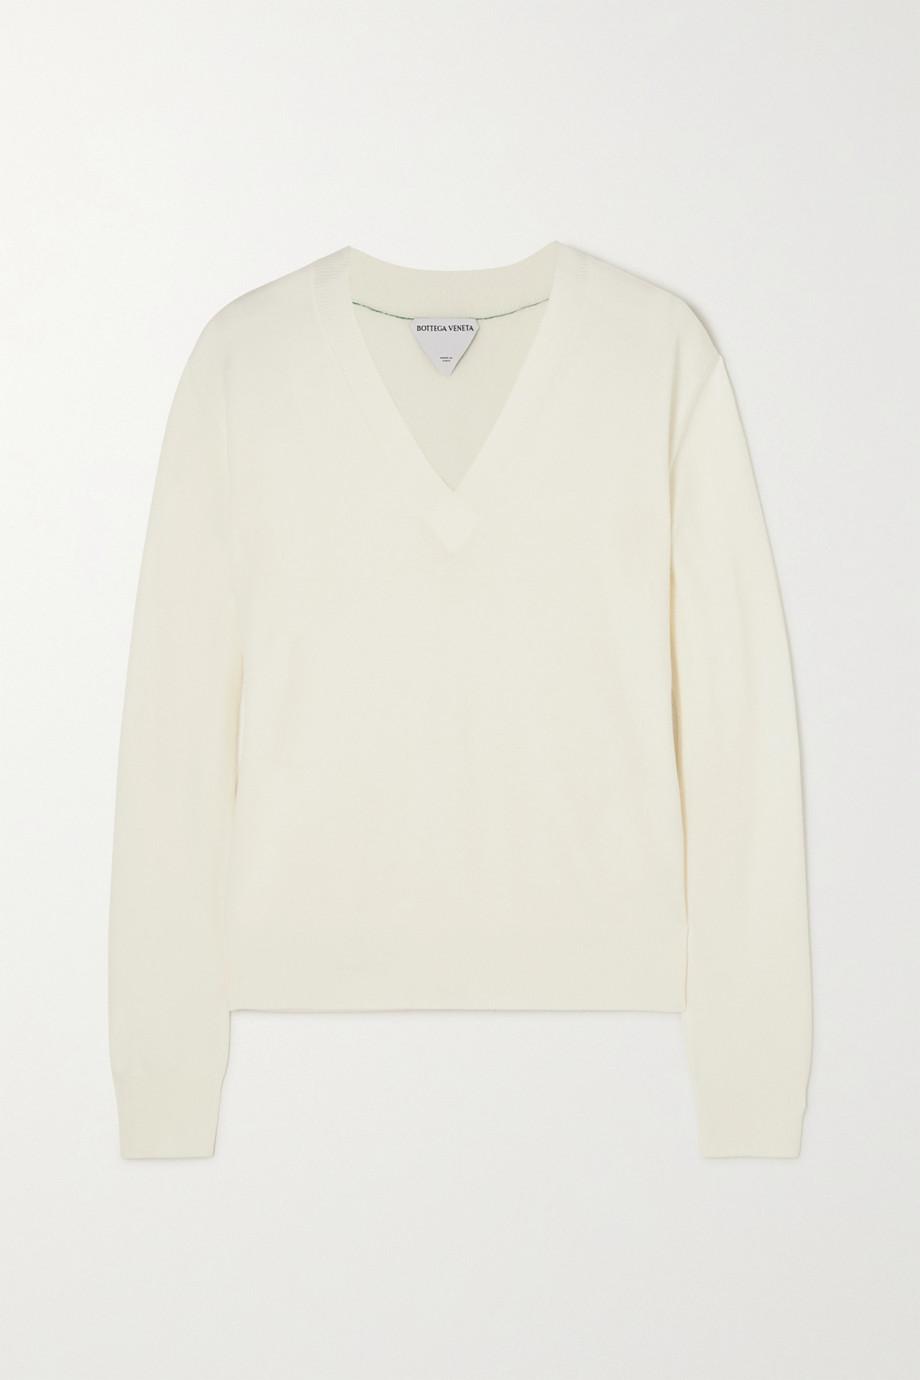 Bottega Veneta Wool-blend sweater